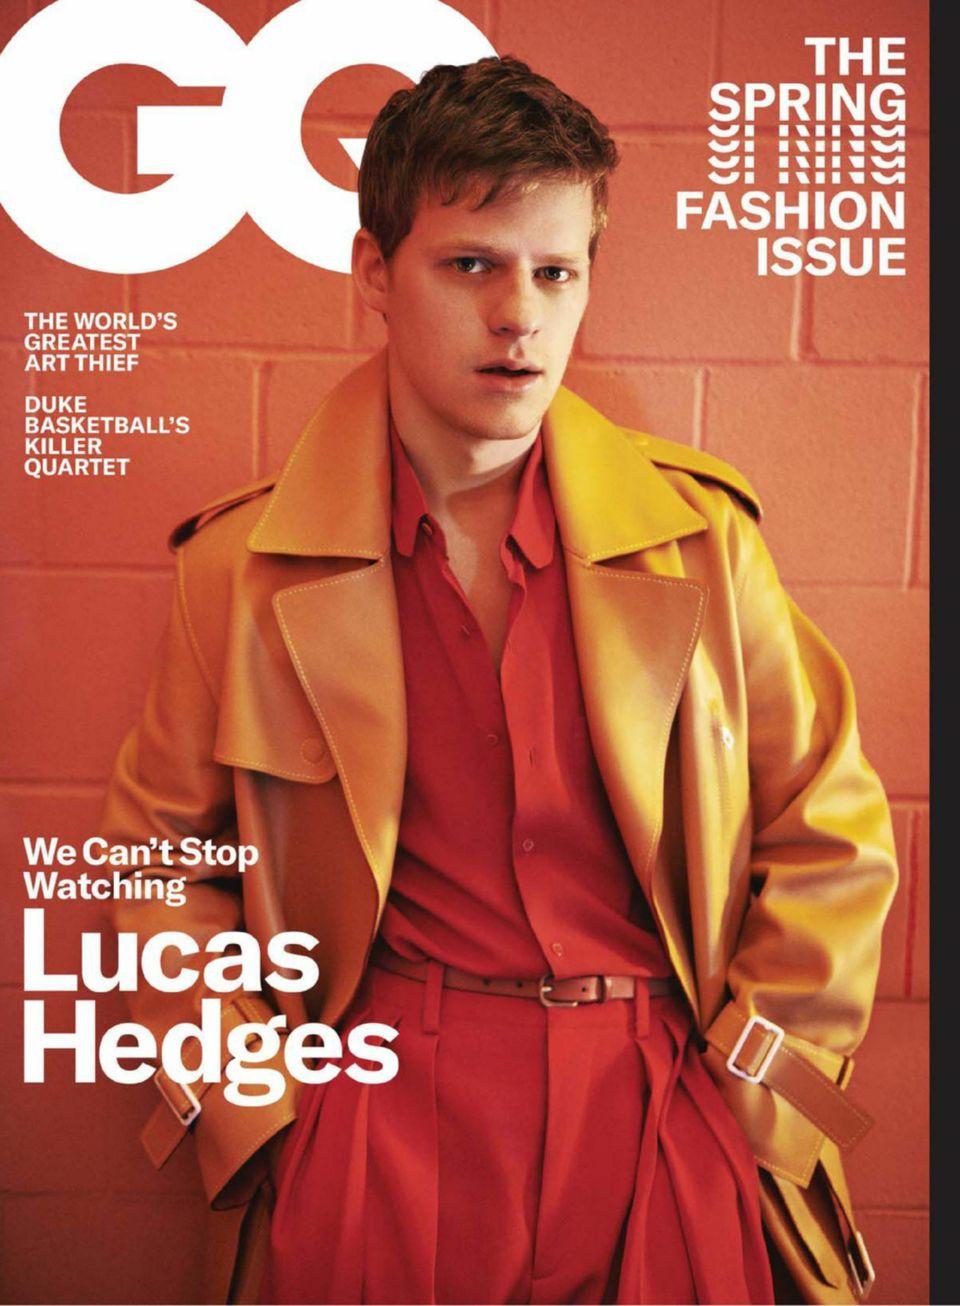 digital copy of GQ-March 2019 issue